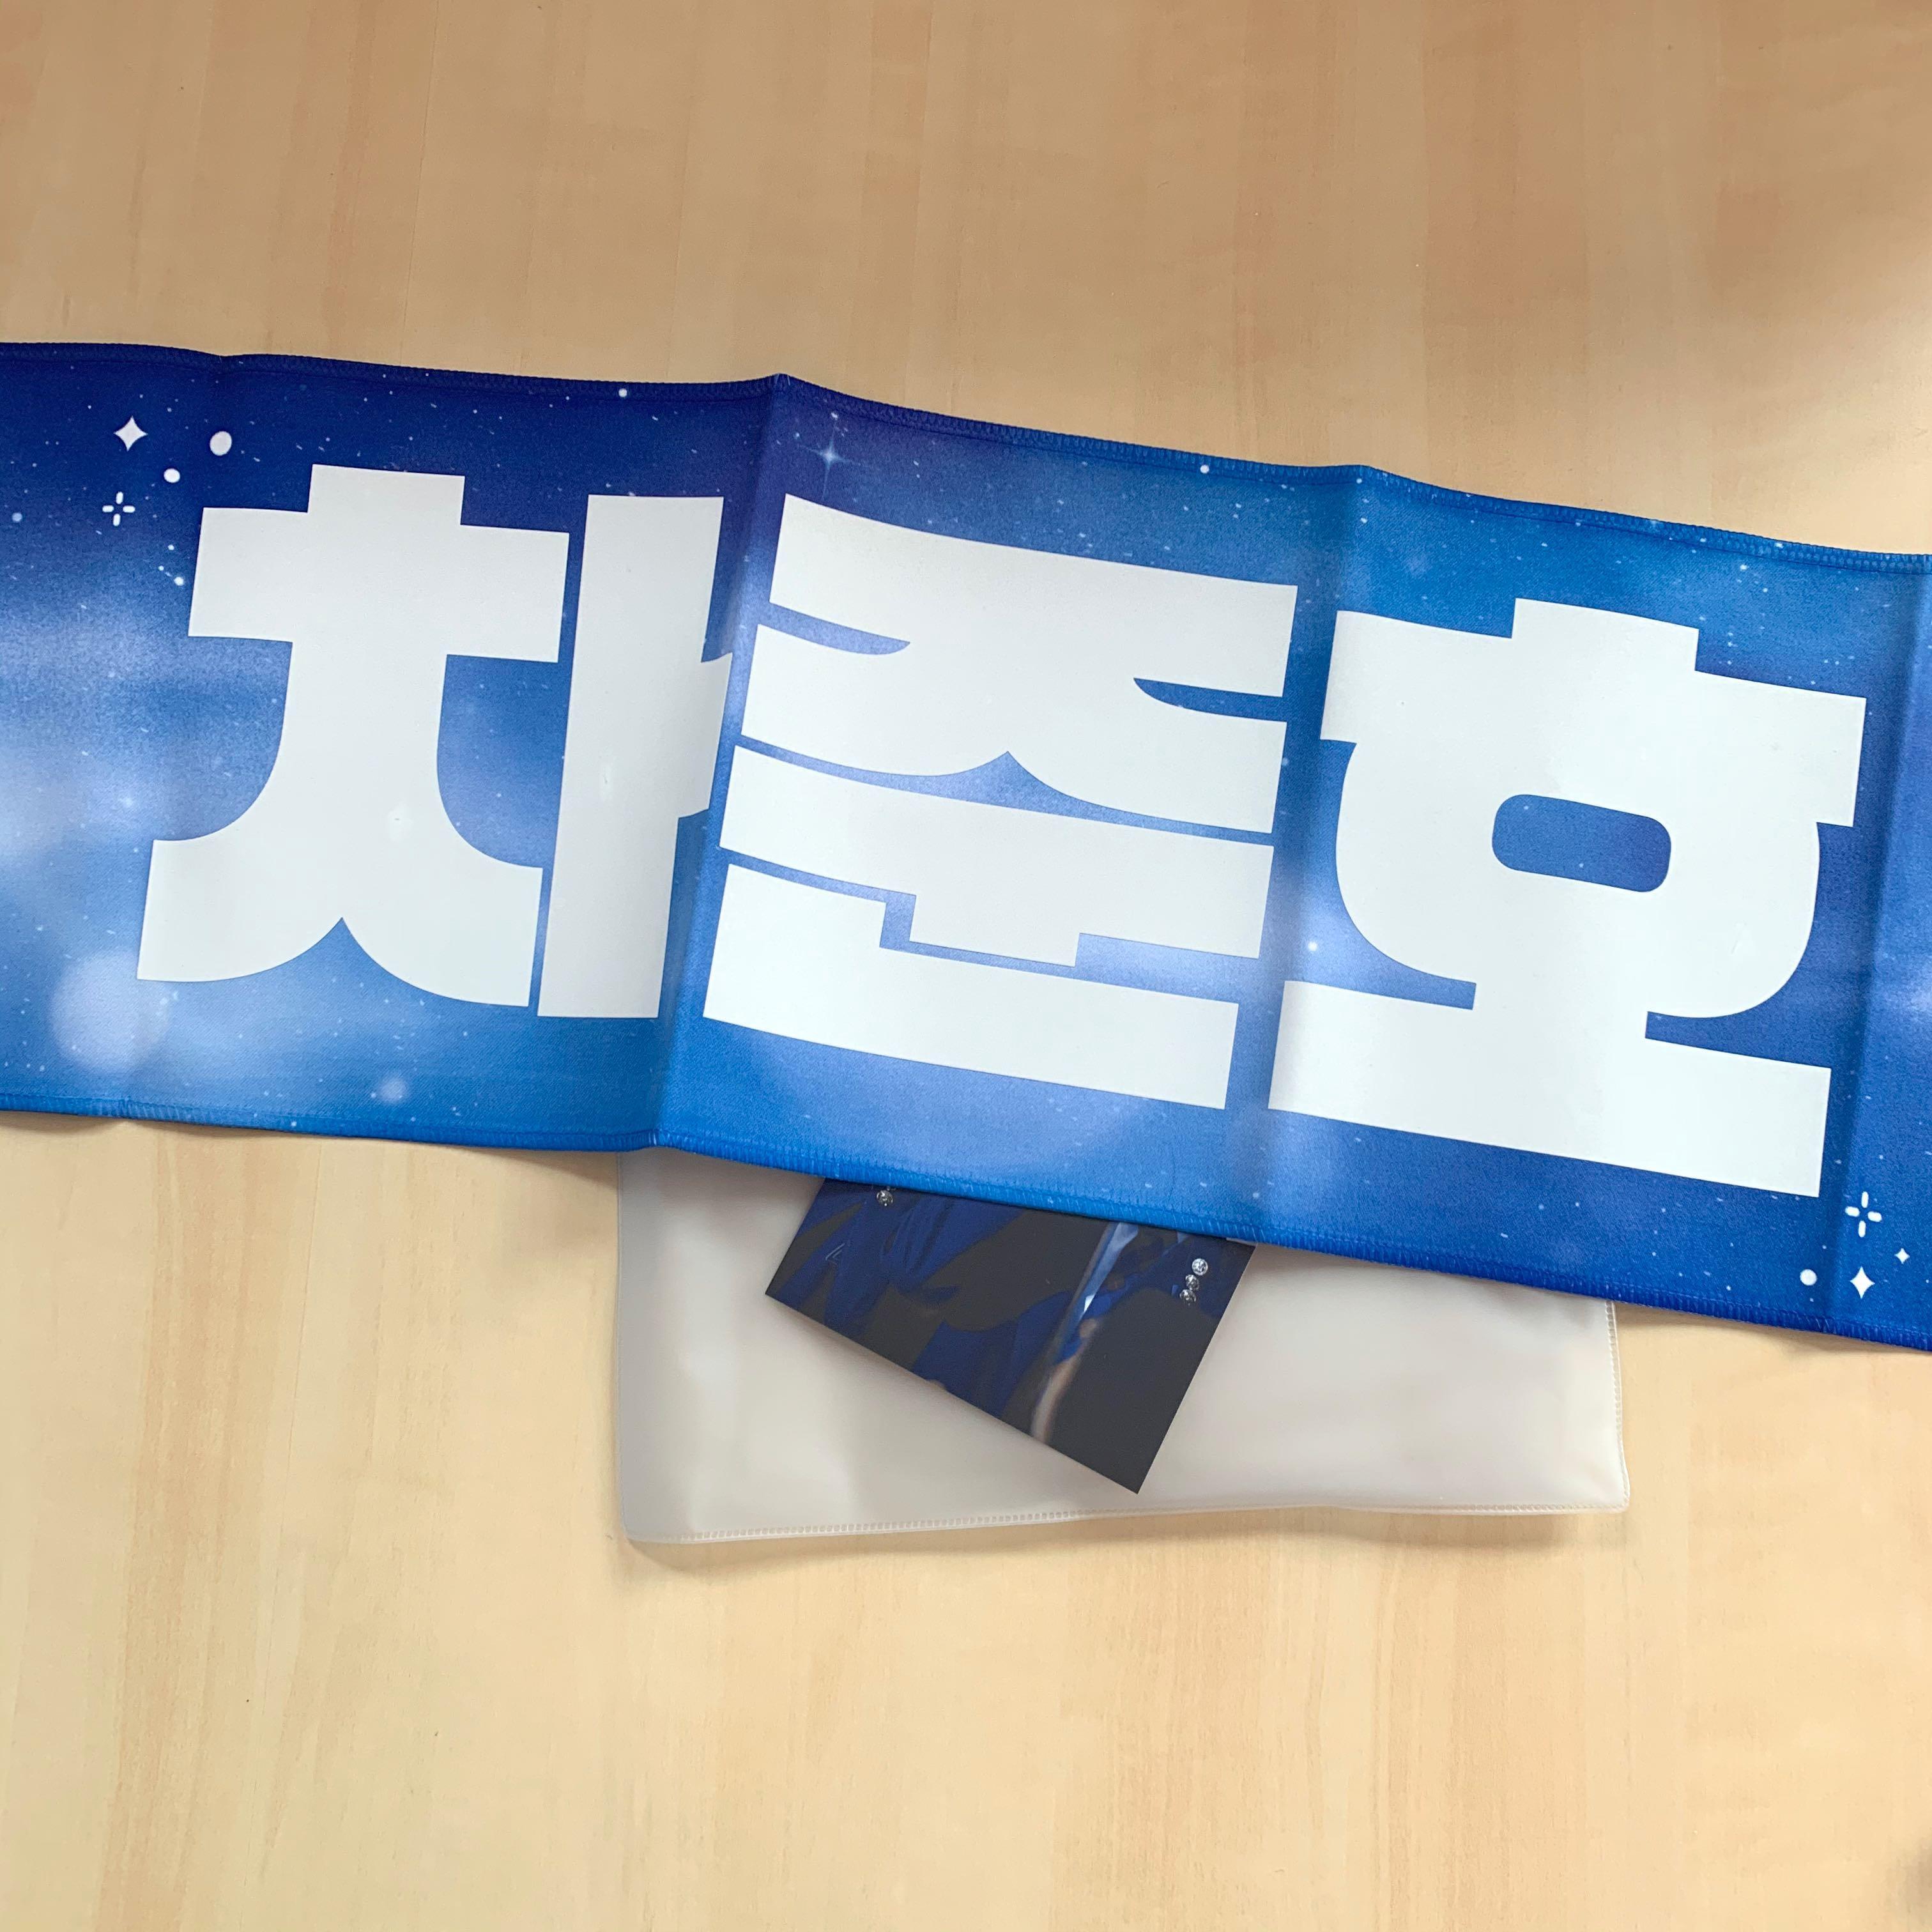 Cha Junho X1 Produce Dream for You Slogan by Laputa